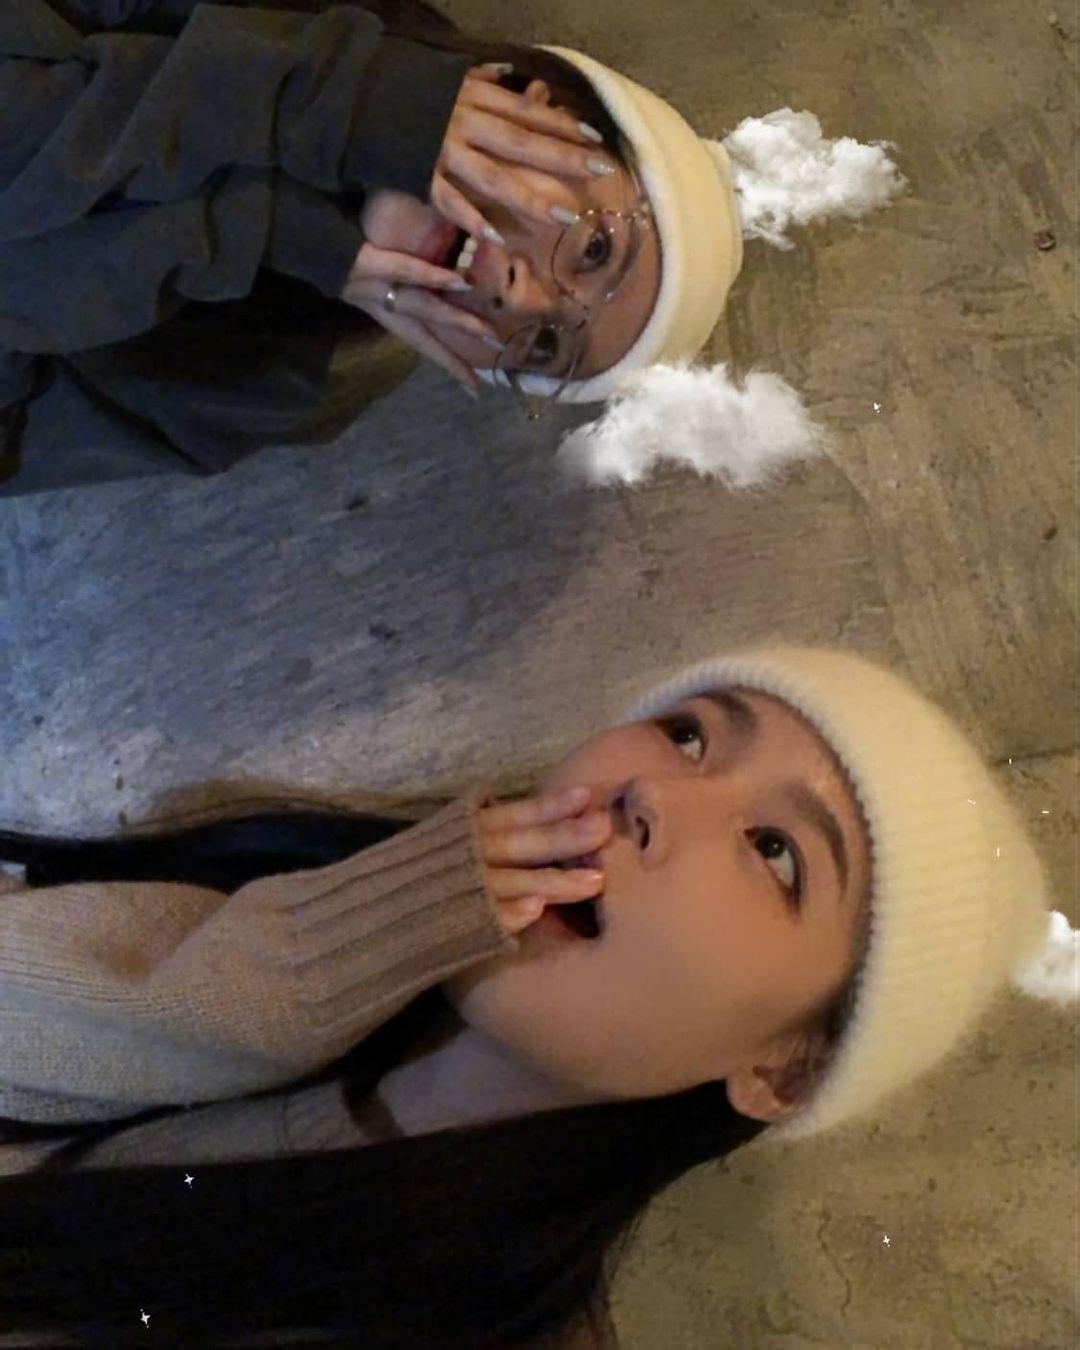 TWICE的Sana和(G)I-DLE赵美延是好朋友 新照片中展示了新友谊。